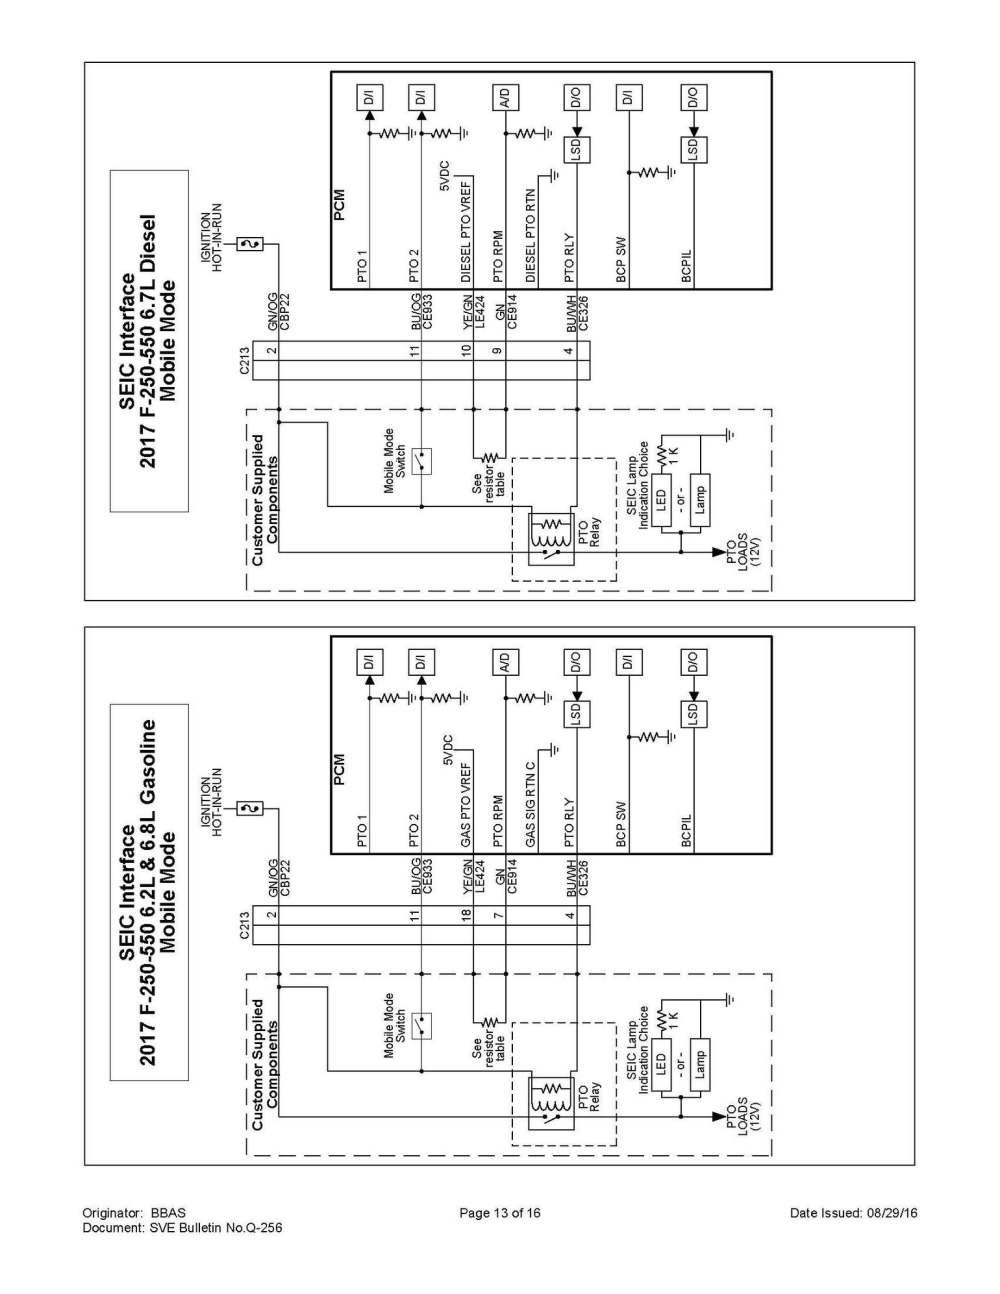 medium resolution of 1999 ford f550 pto wiring diagram wiring diagram and 4r70w transmission wiring diagram ford aod transmission wiring diagram